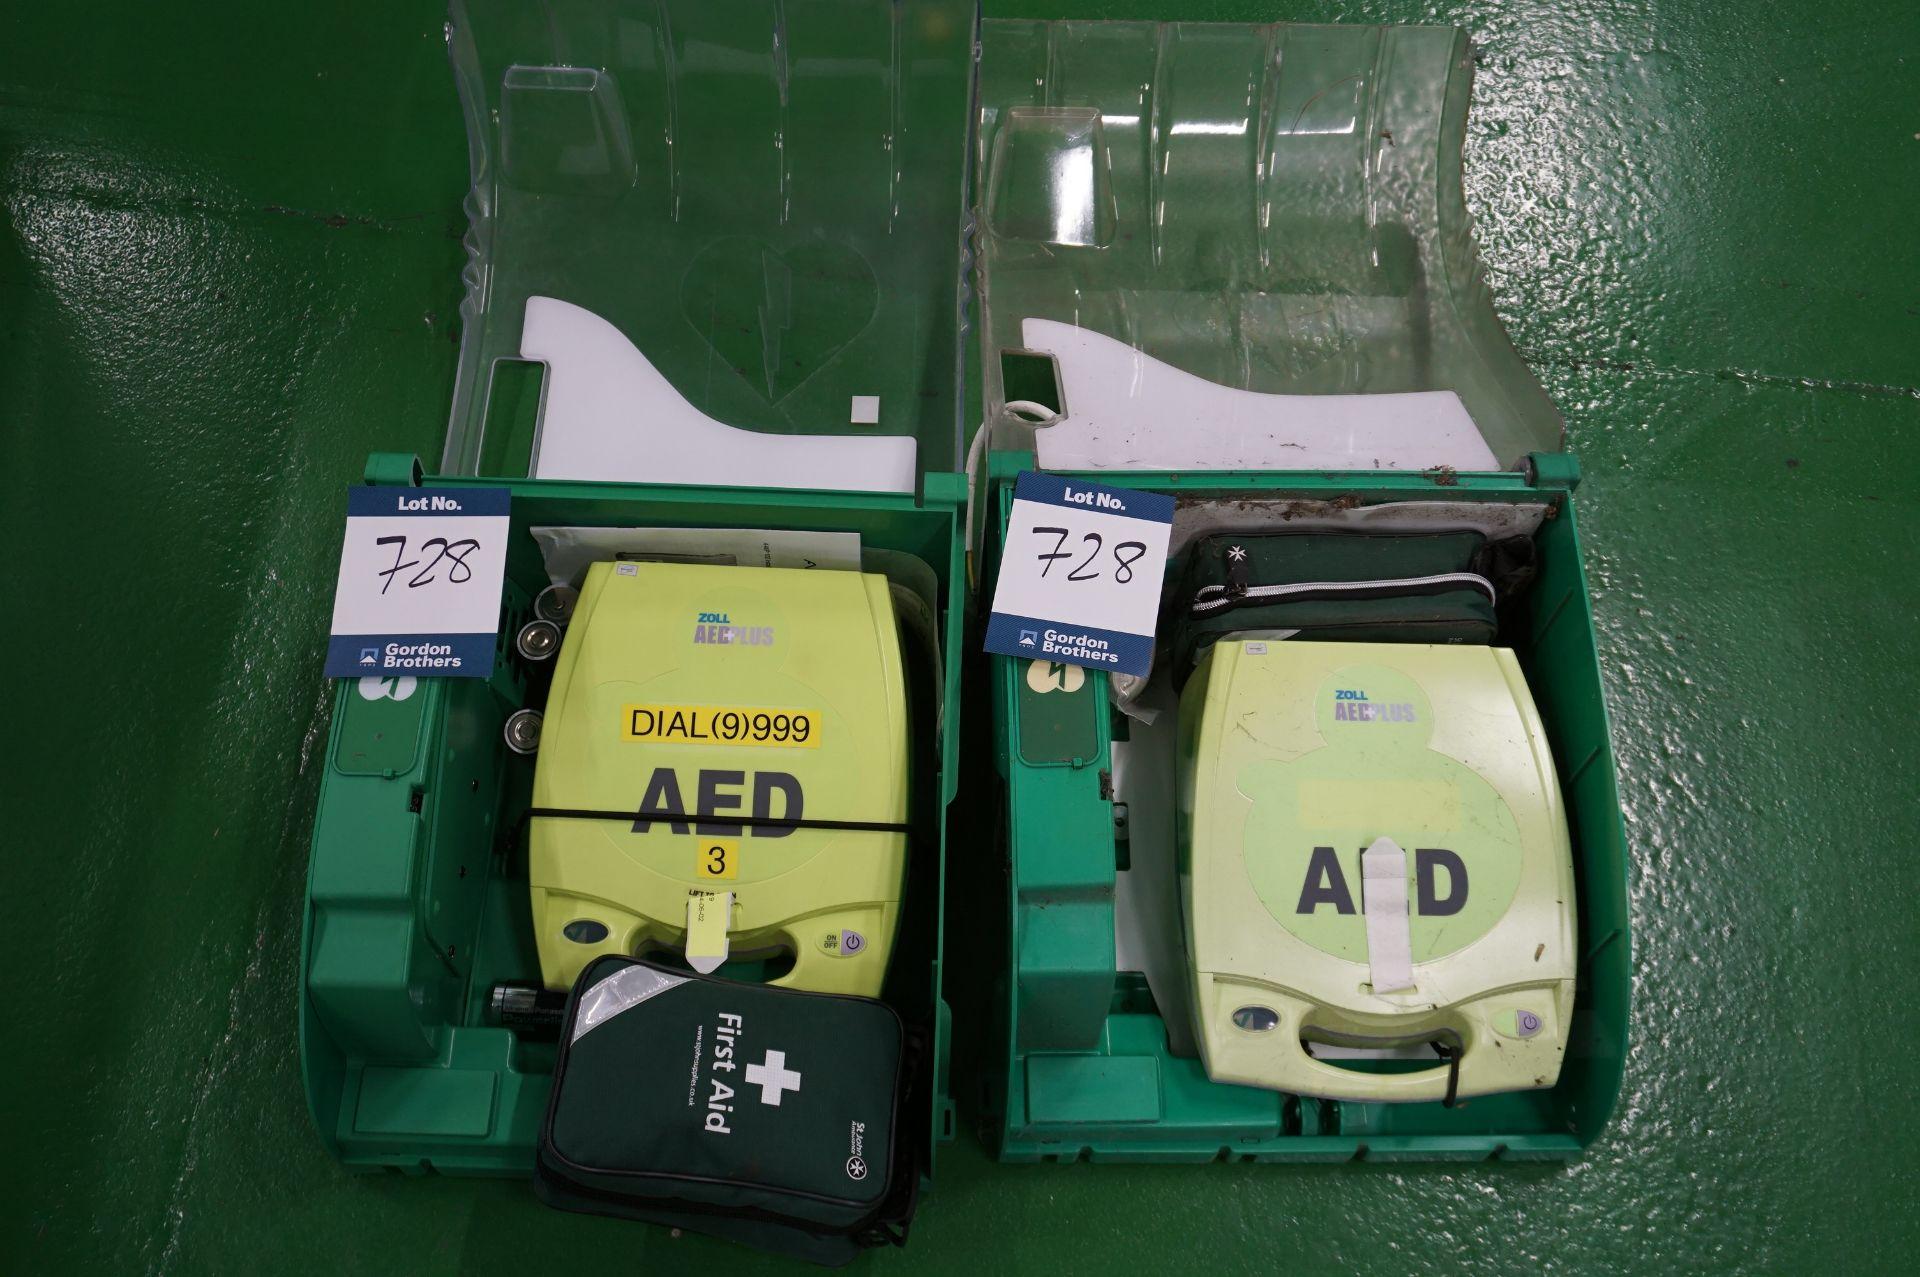 1 x Zoll AEDPLUS Avia 100:X2A100-XX100 battery operated defibrillator and 1 x Zoll AEDPLUS X18D01850